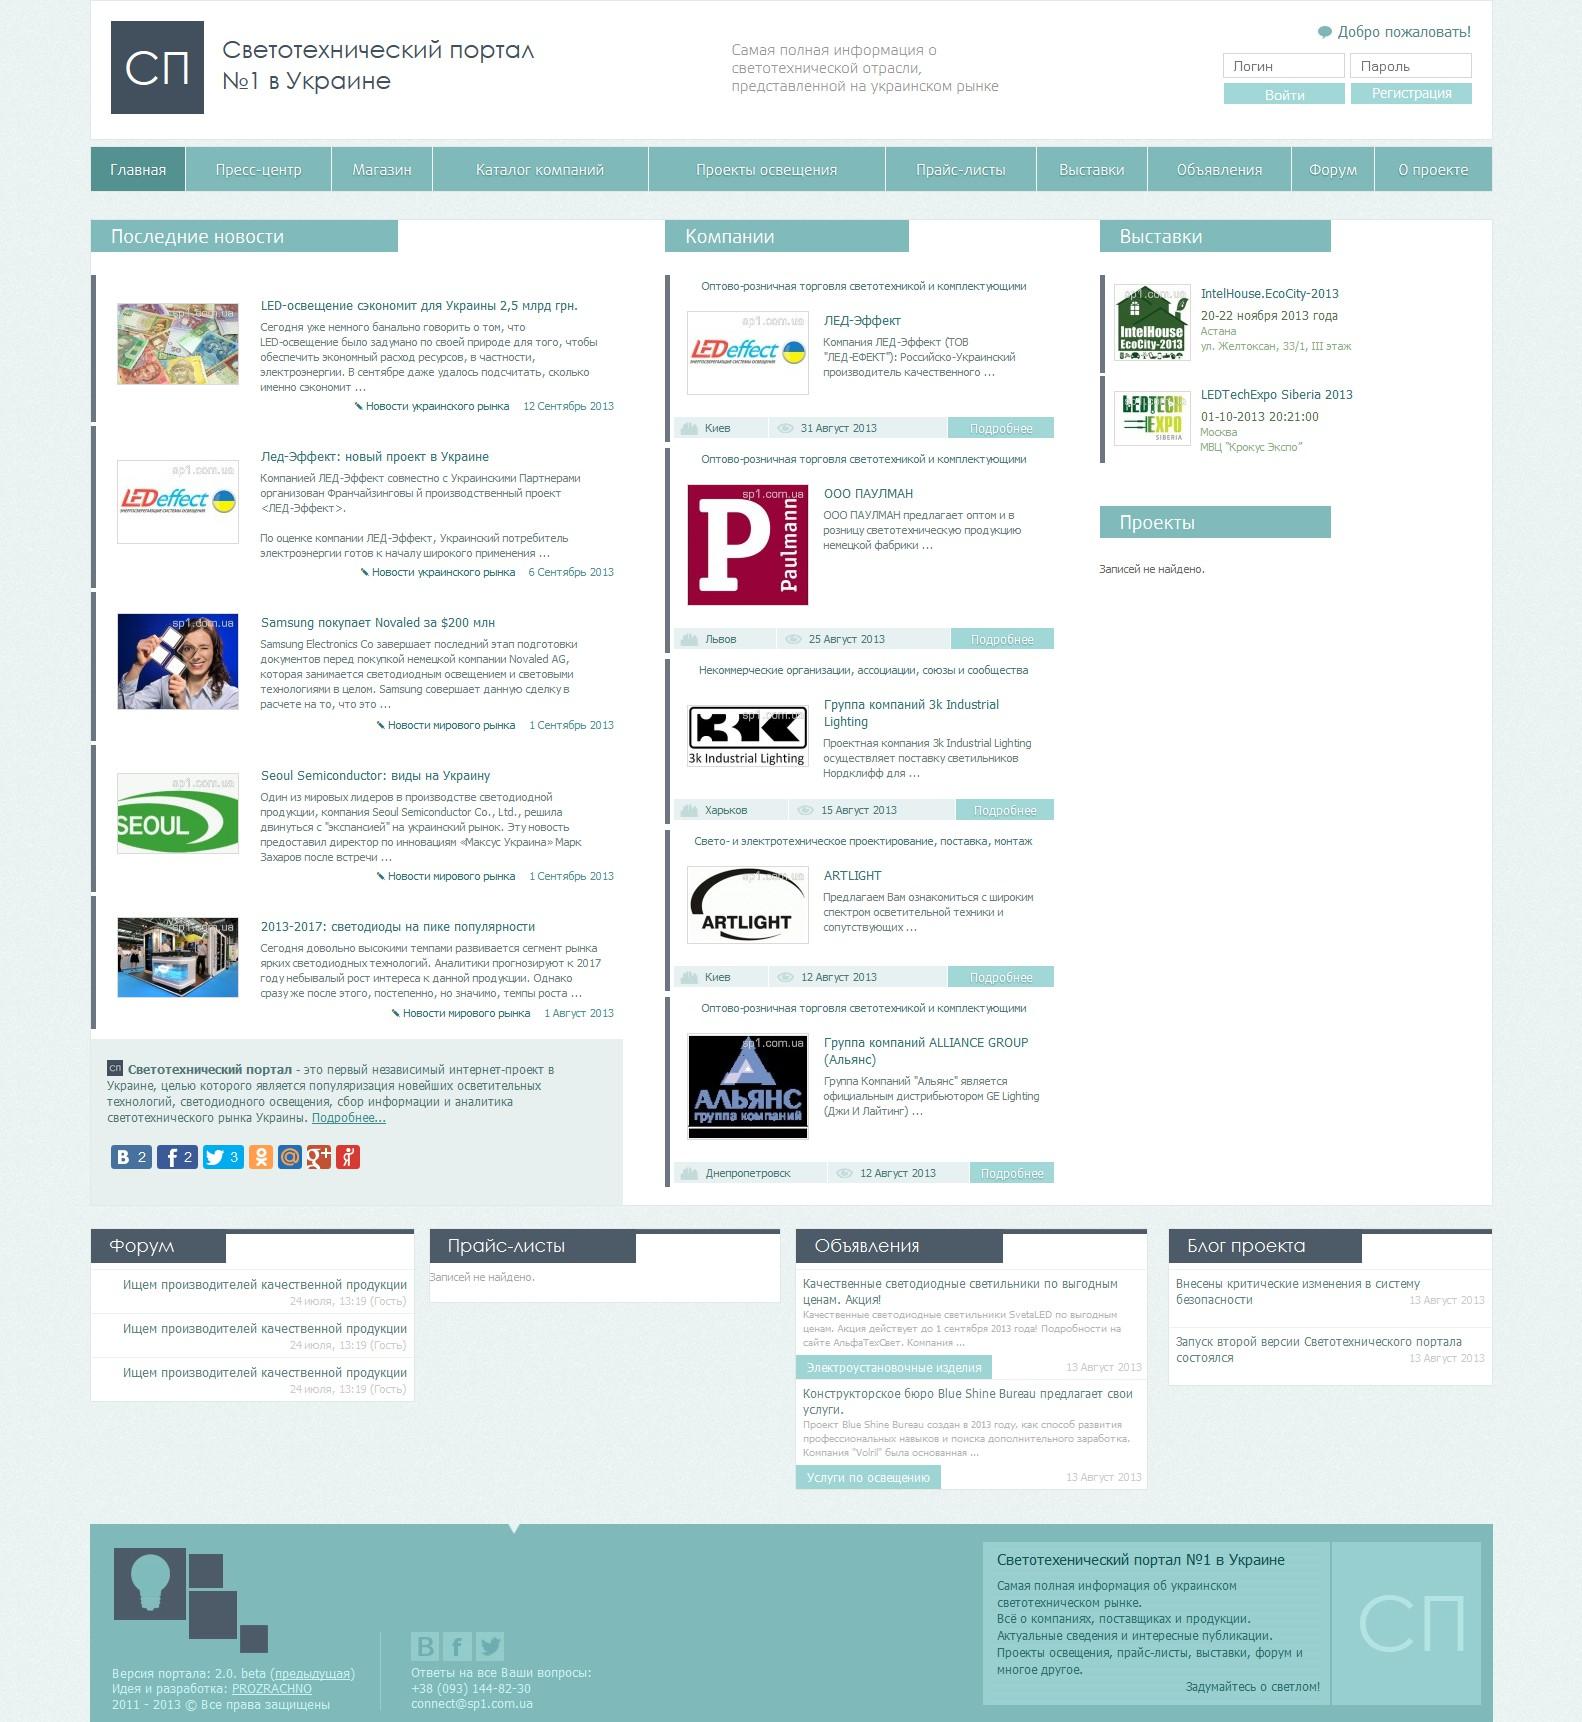 Верстка проекта SP1.COM.UA